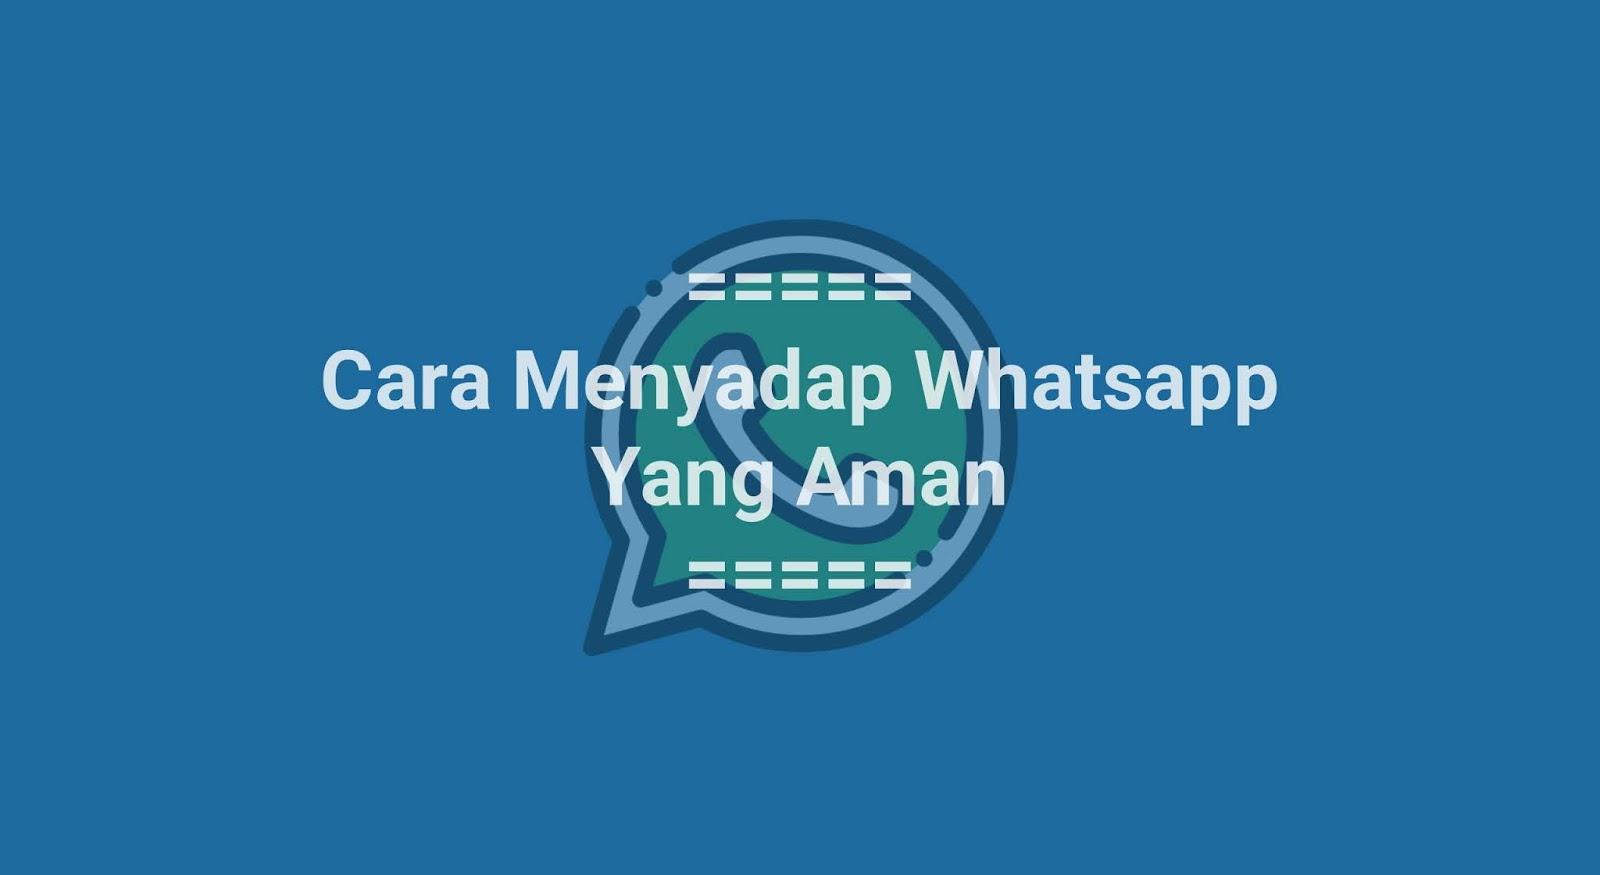 Cara Menyadap WhatsApp yang Aman